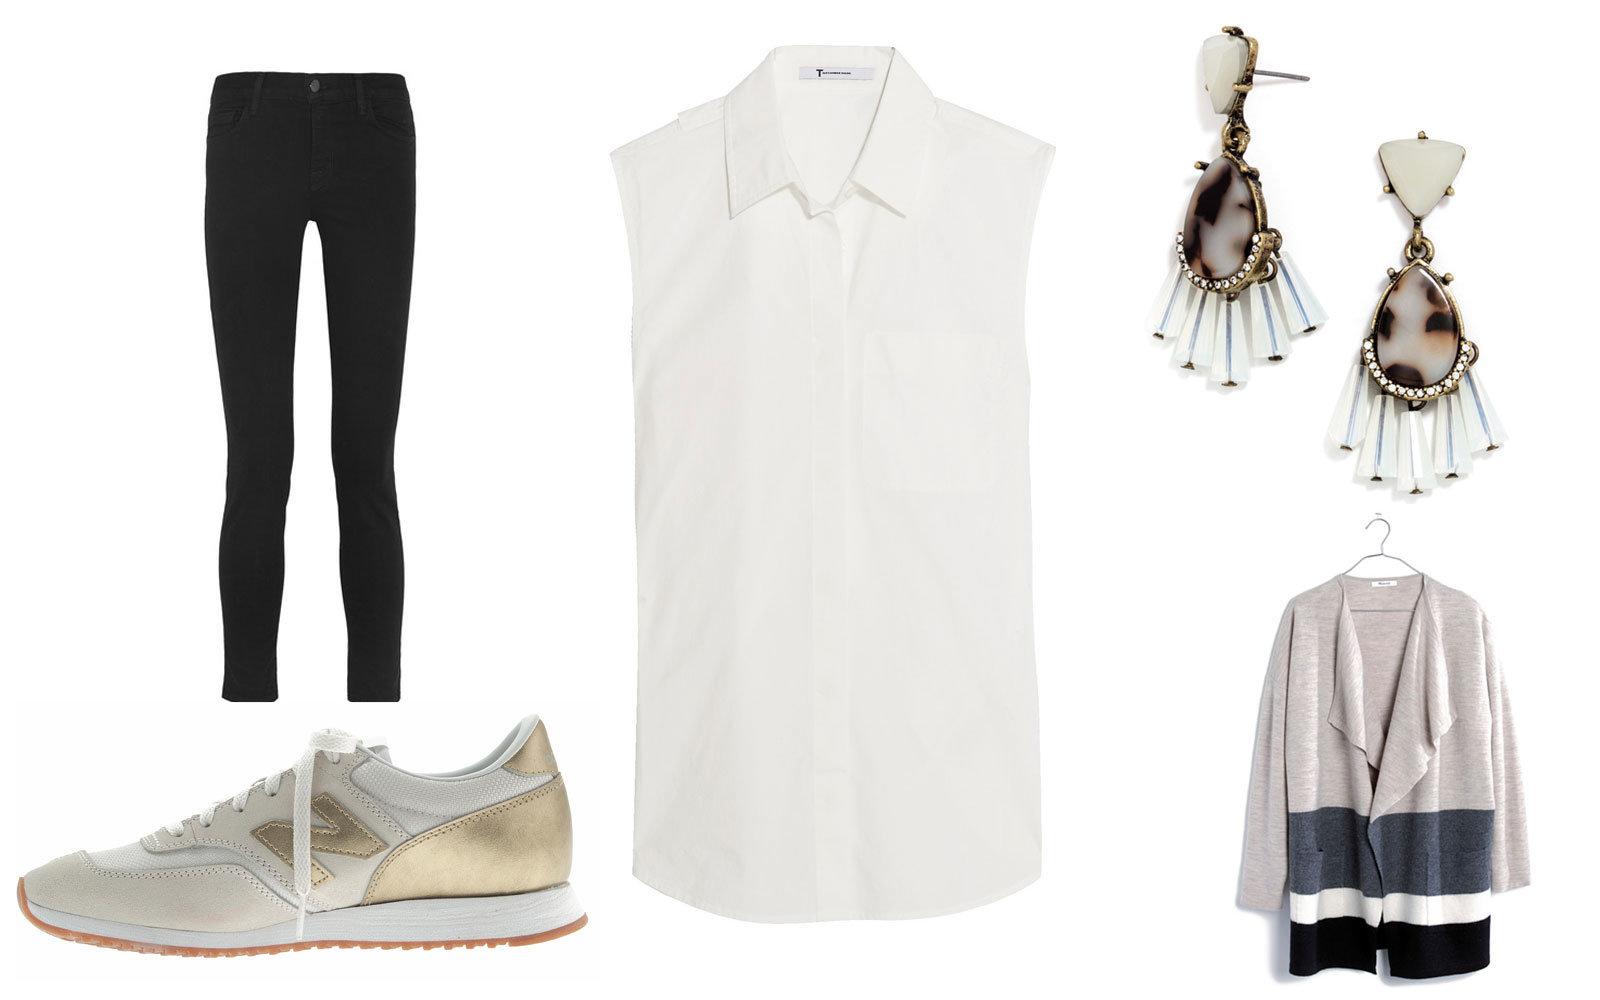 black-skinny-jeans-earrings-white-collared-shirt-white-shoe-sneakers-gold-white-cardiganl-spring-summer-weekend.jpg